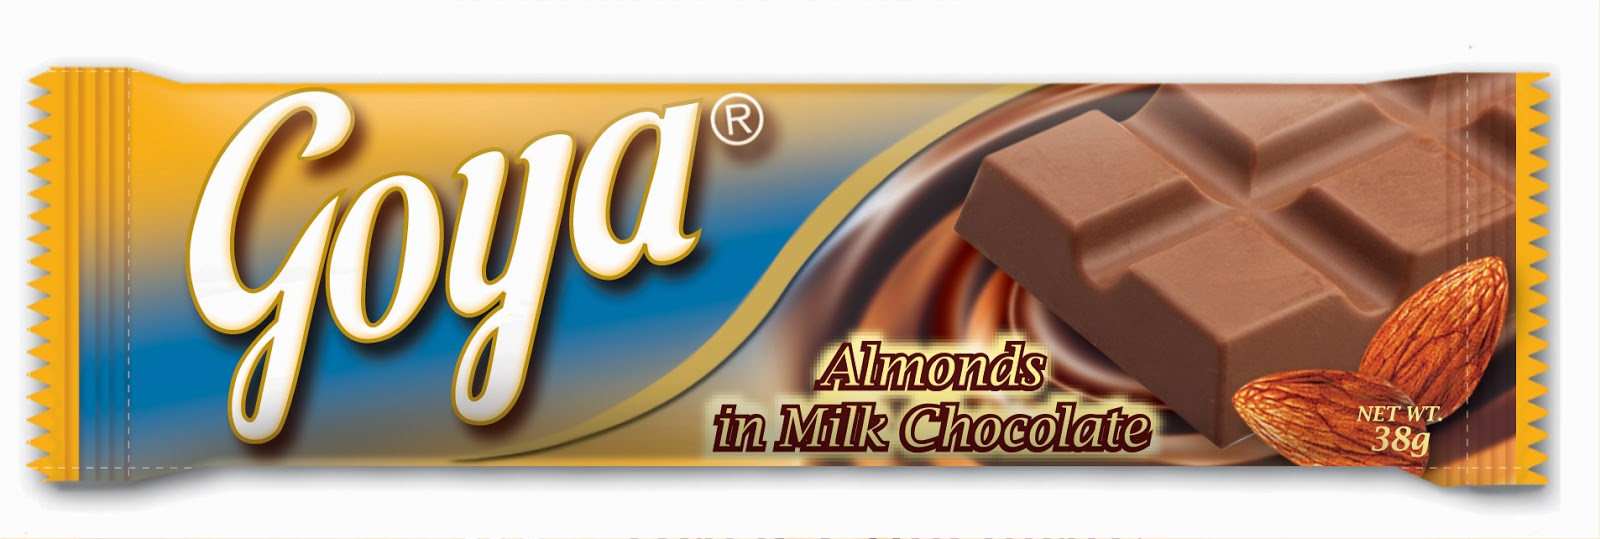 Goya Dark Chocolate Ingredients